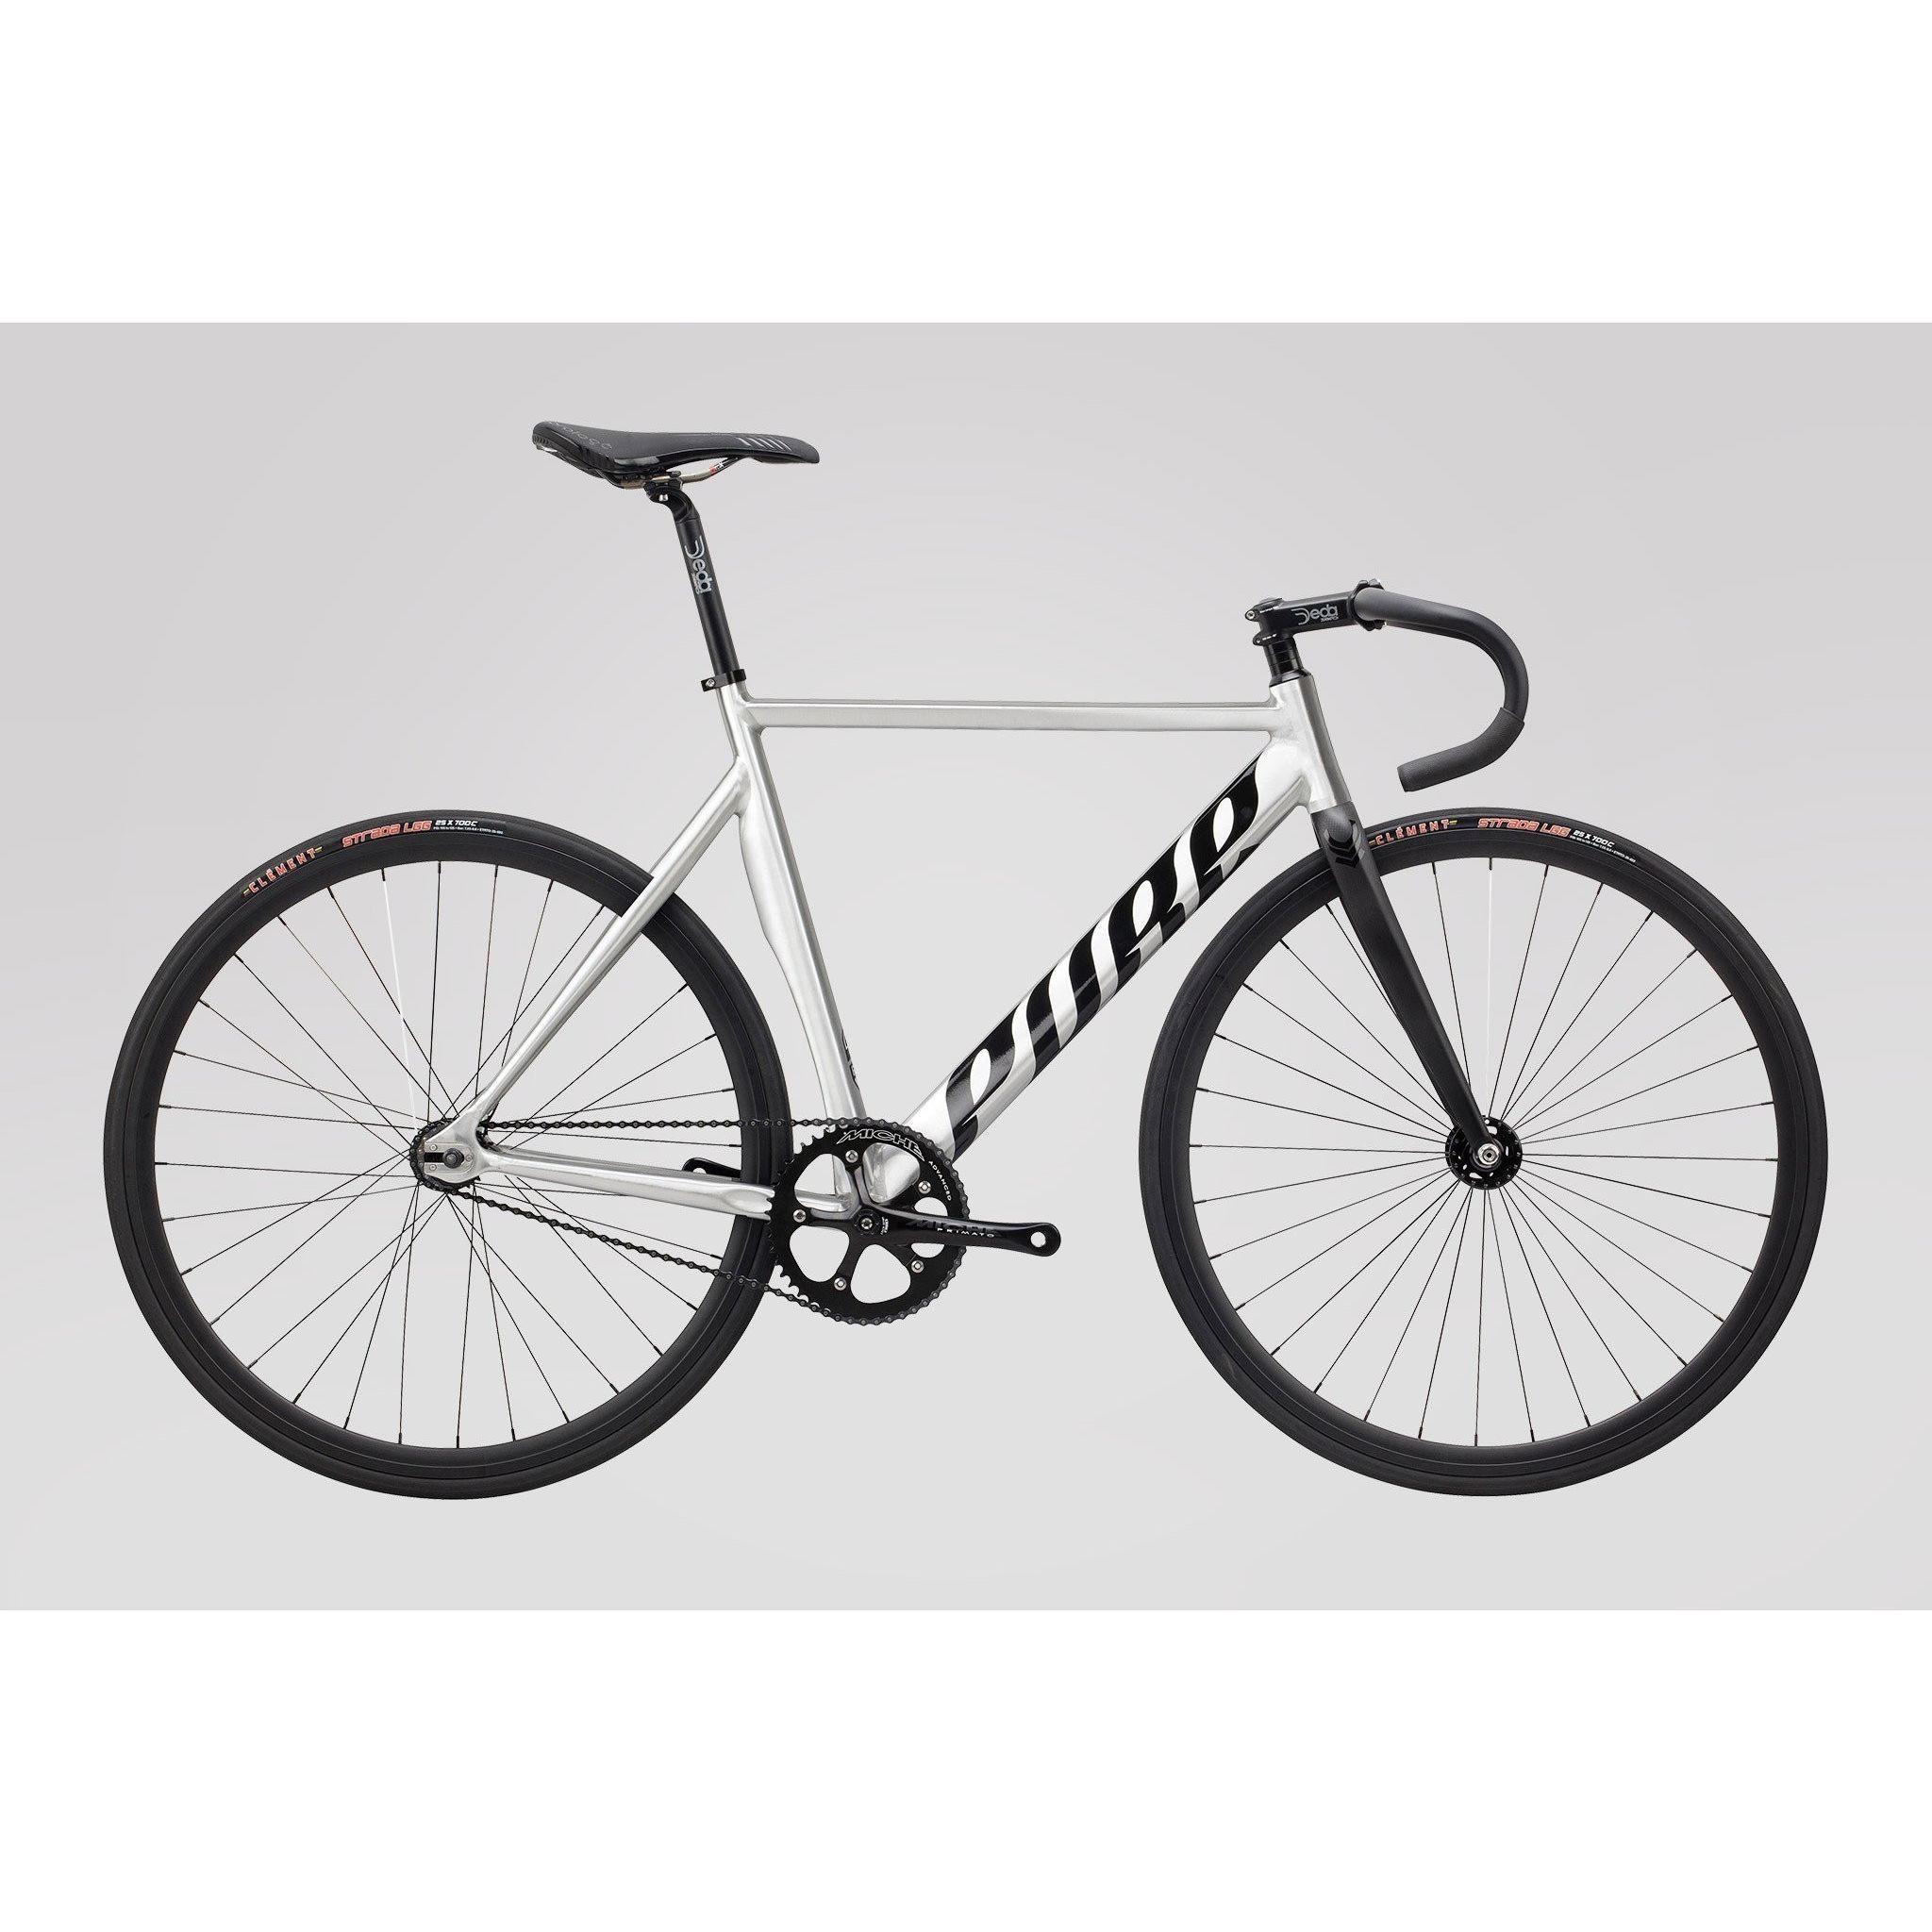 Pure Cycles Keirin Pro Elite Raw Aluminum Fixed Gear Track Bike